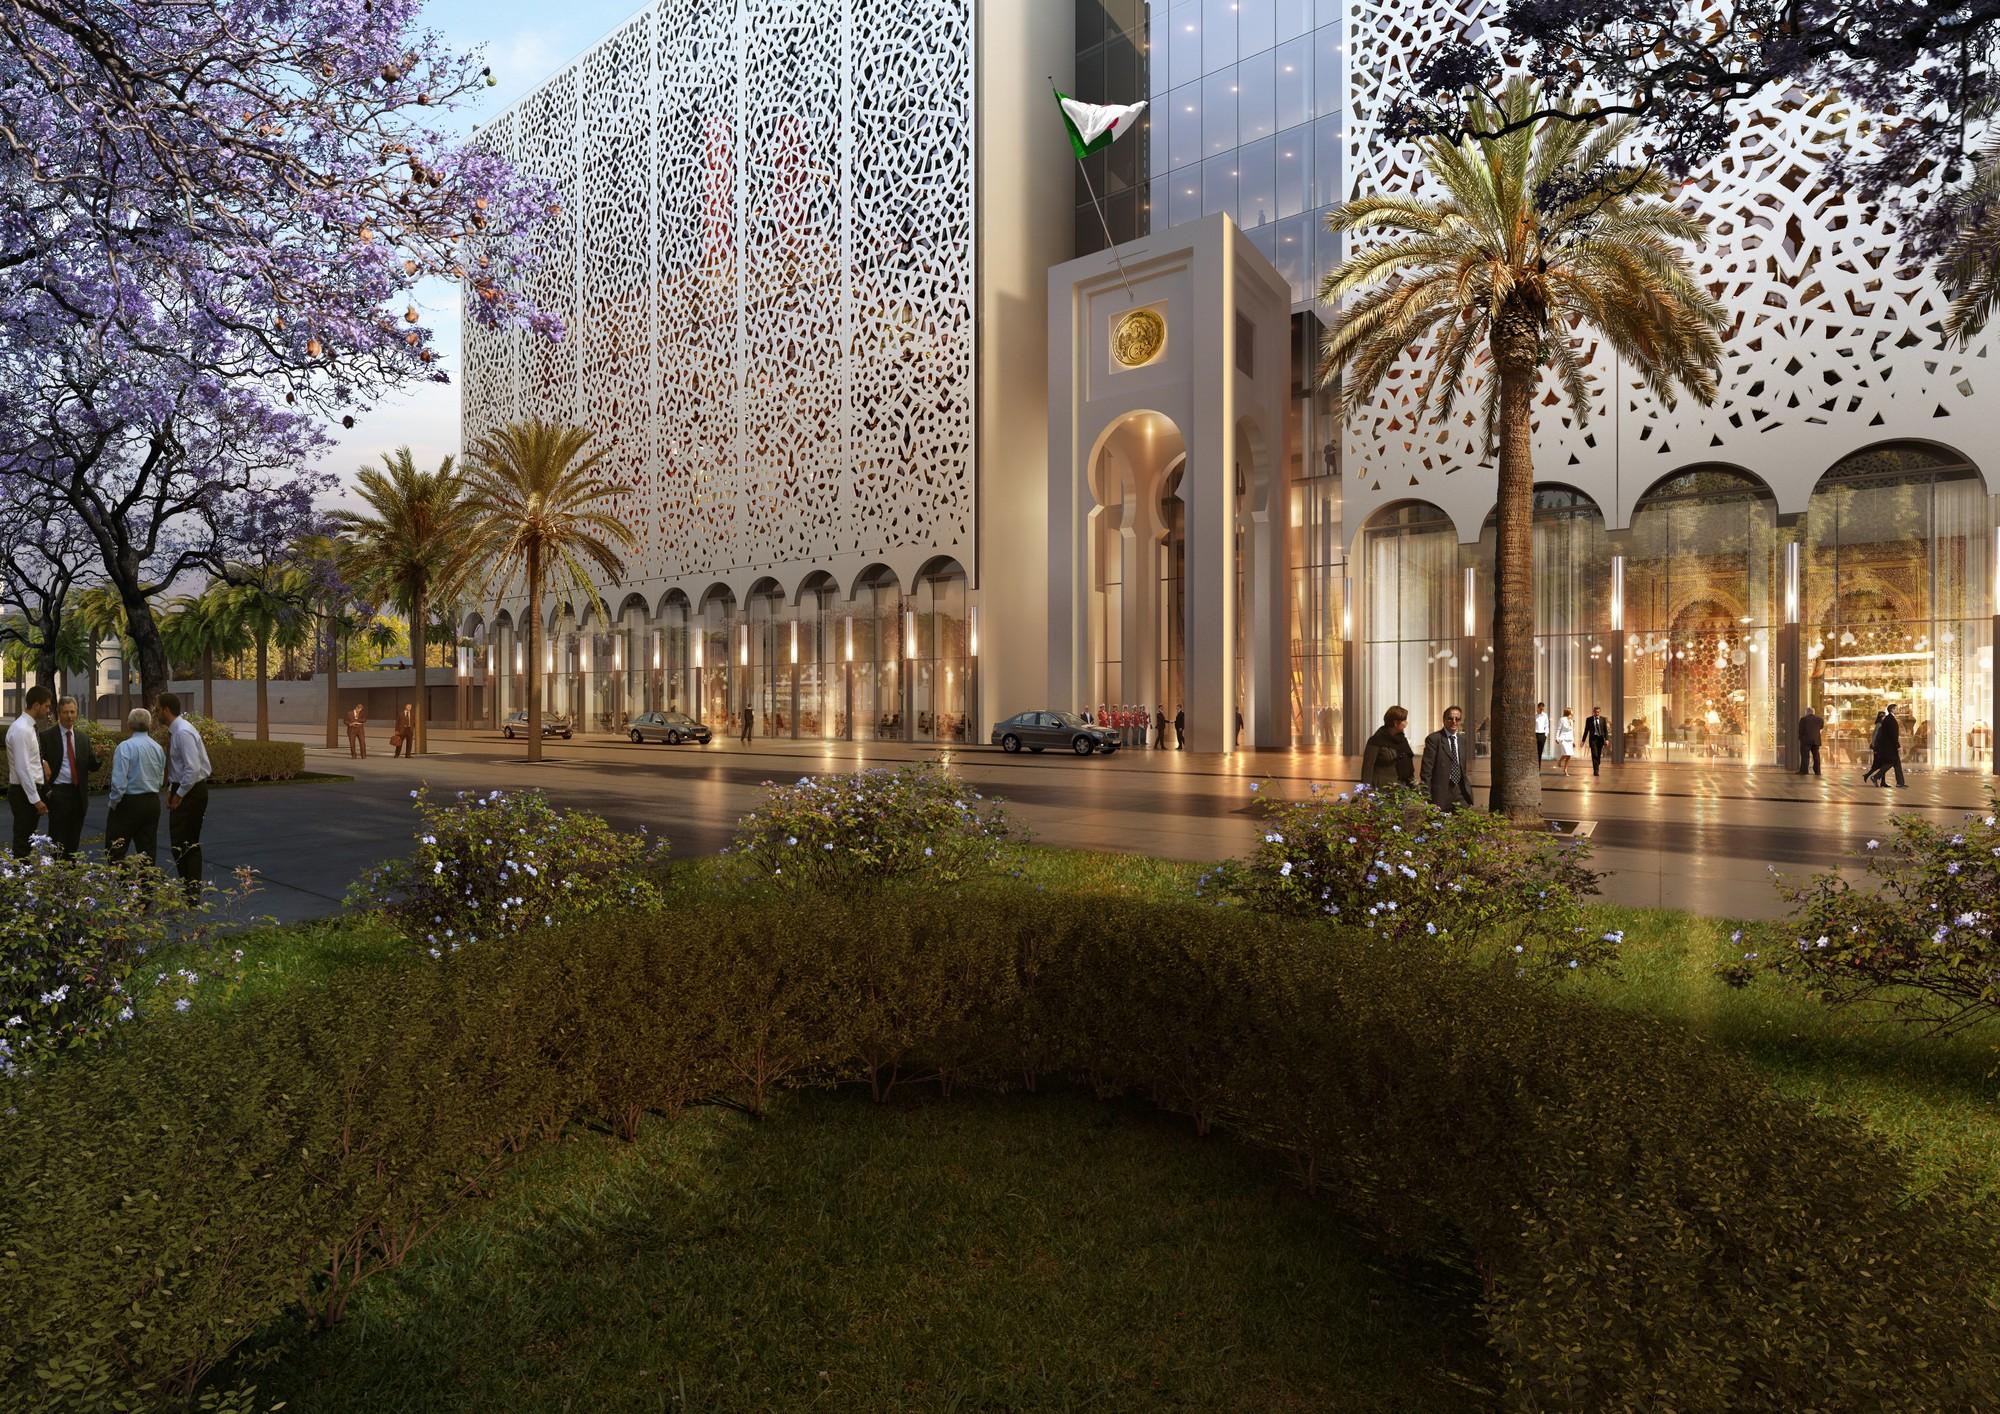 gallery of bureau architecture m diterran e designs algerian parliament around a vast plaza 7. Black Bedroom Furniture Sets. Home Design Ideas